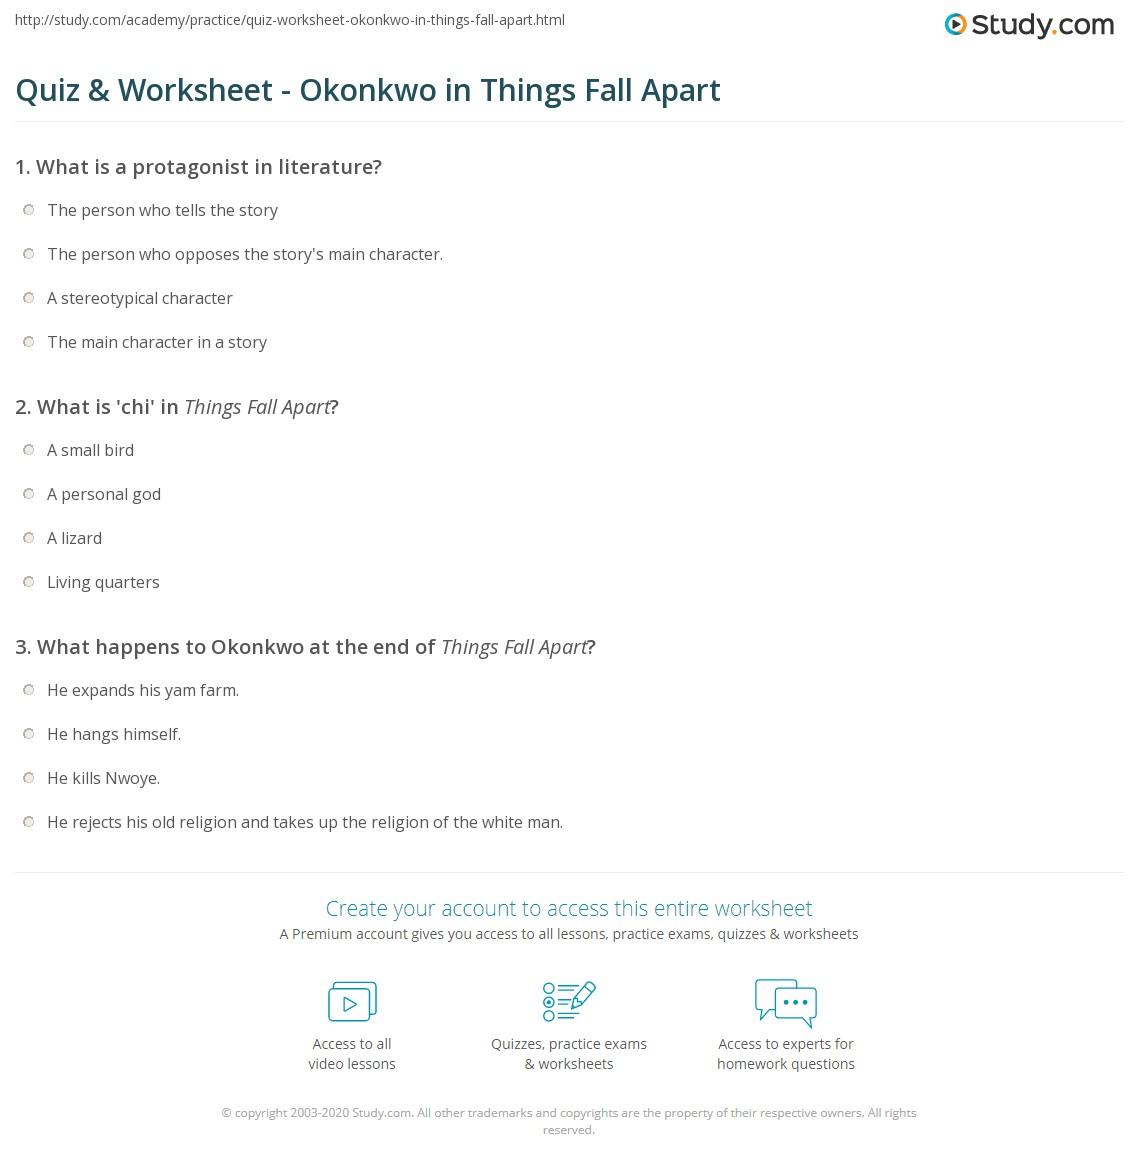 Quiz Worksheet Okonkwo In Things Fall Apart Study Com